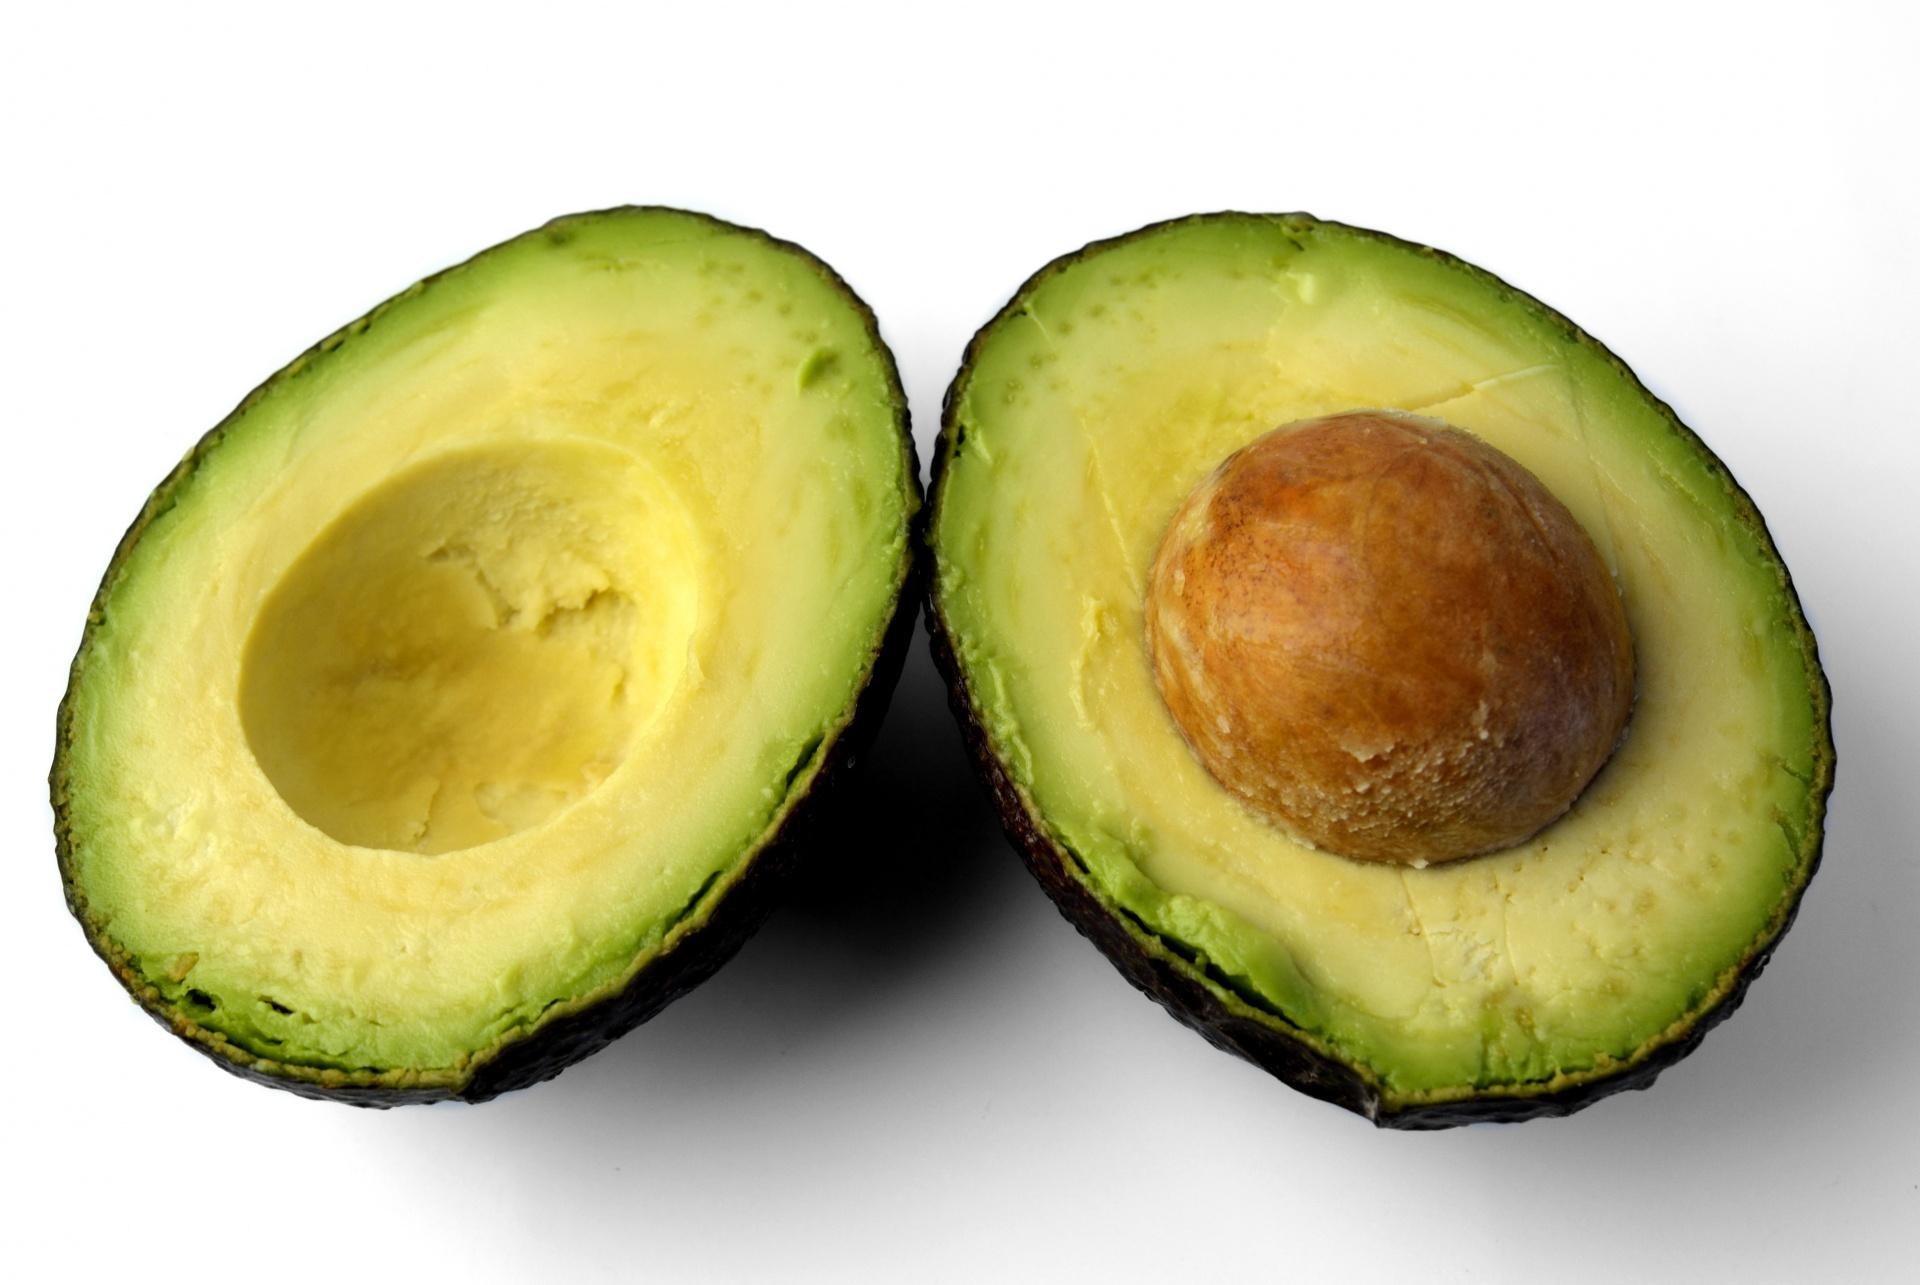 Top 10 Proven Benefits of Avocado